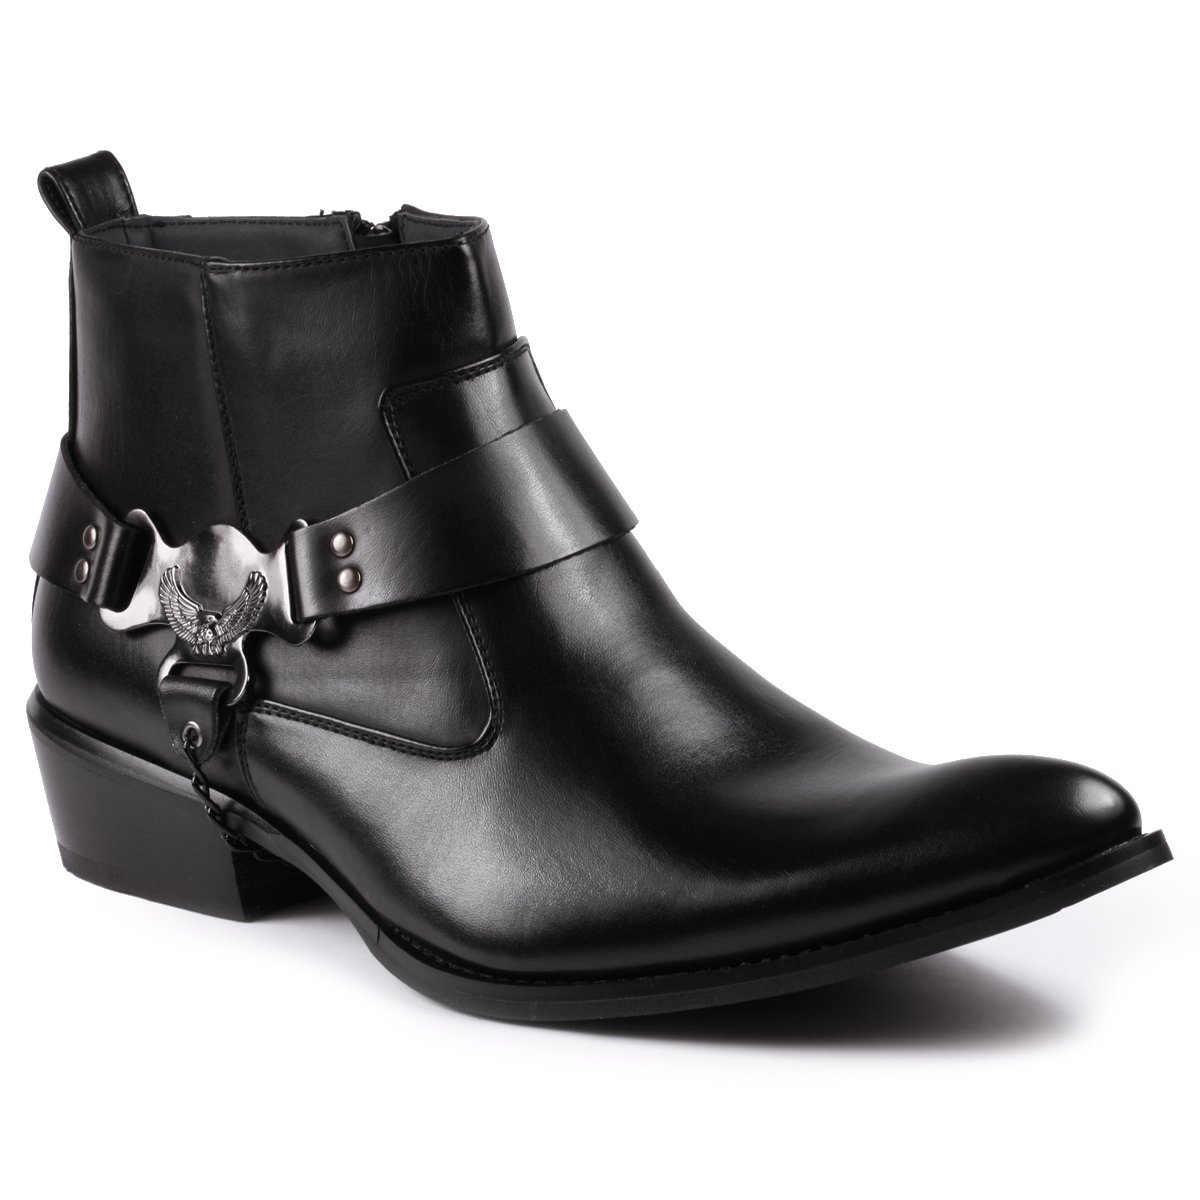 Metrocharm Diego-03 Men's Belt Chain Strap Western Cowboy Boots (13 D(M) US, Black)